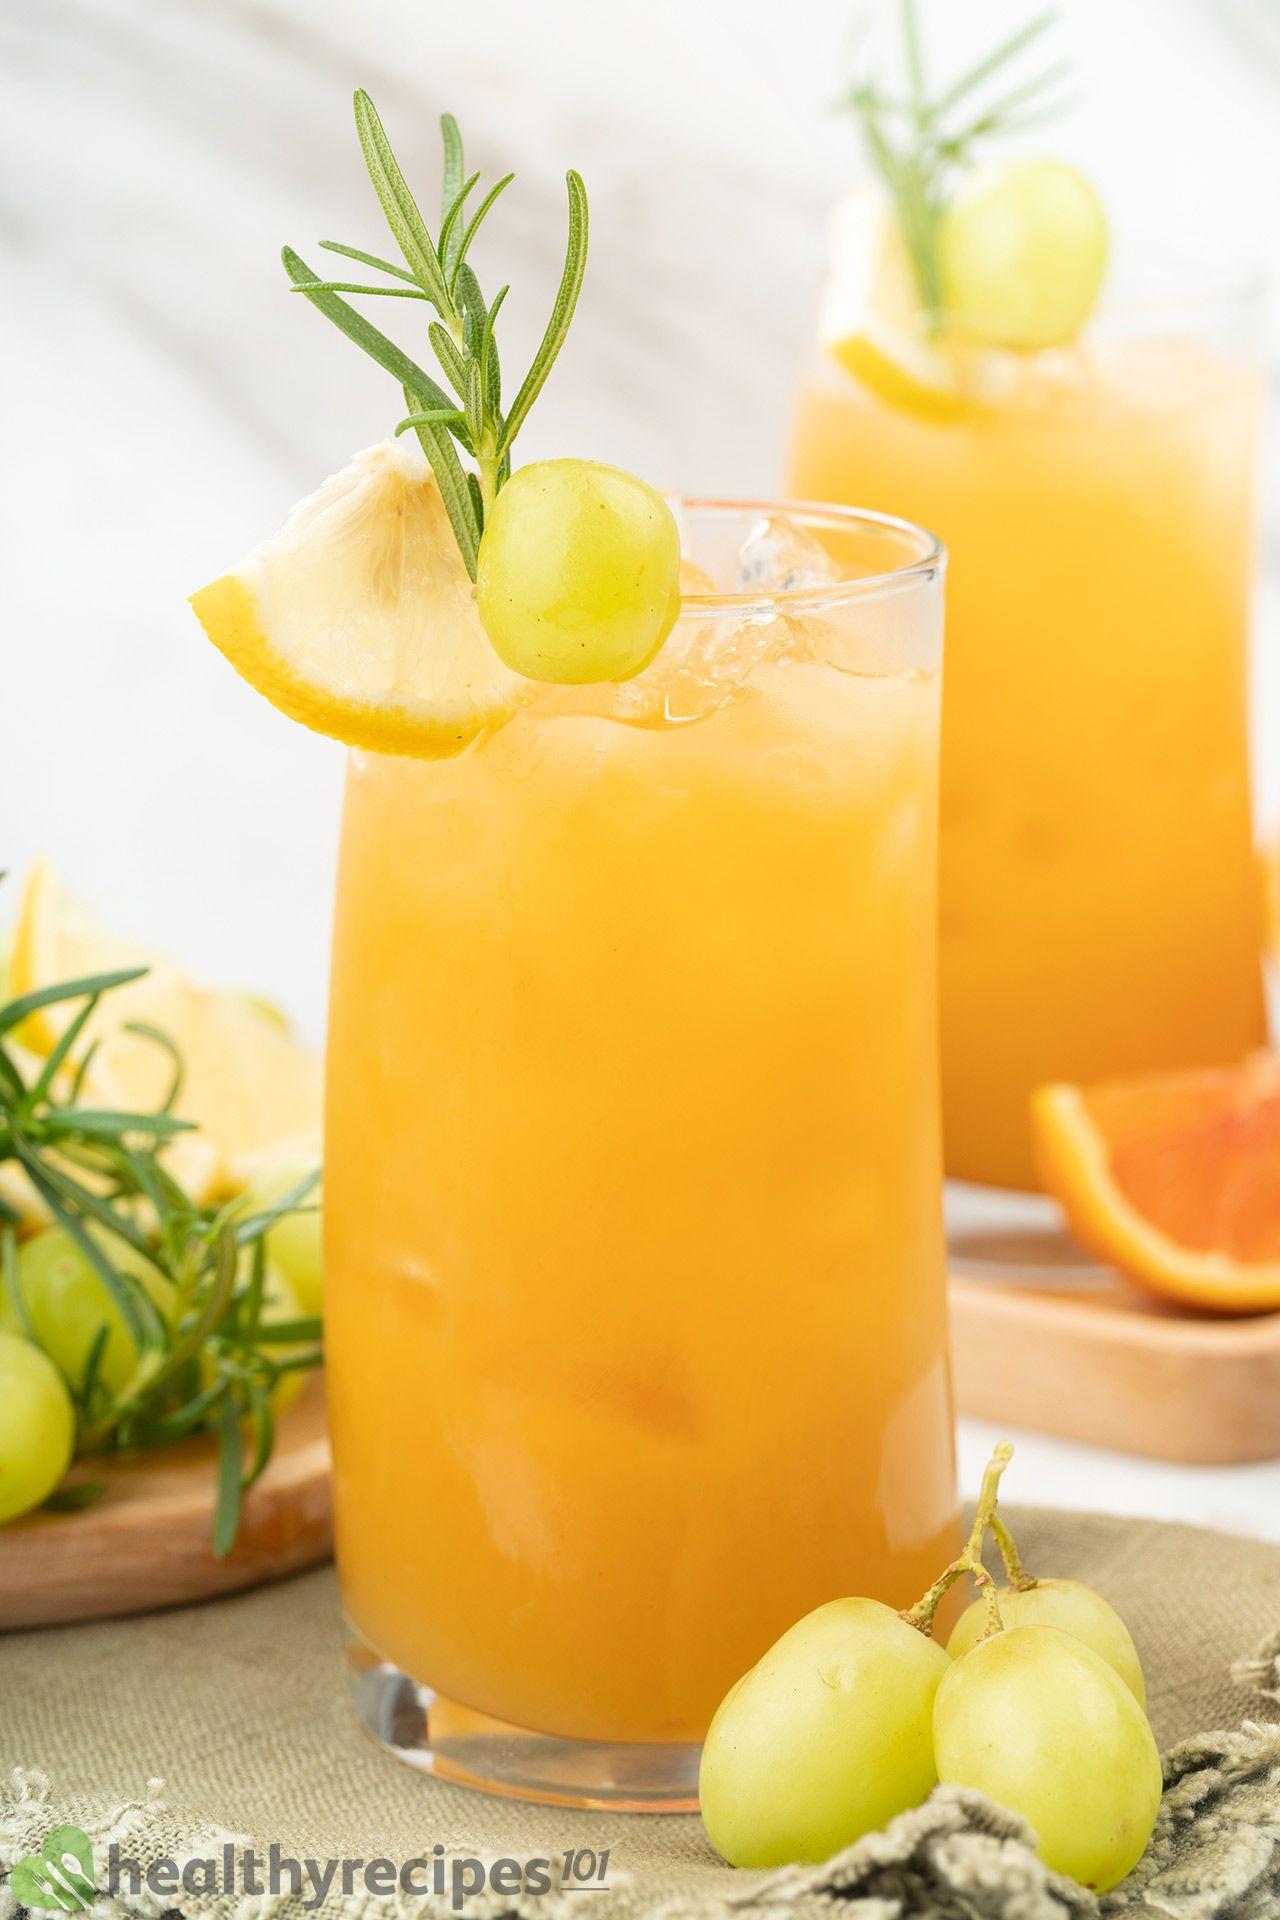 Homemade Grapefruit Juice Recipe